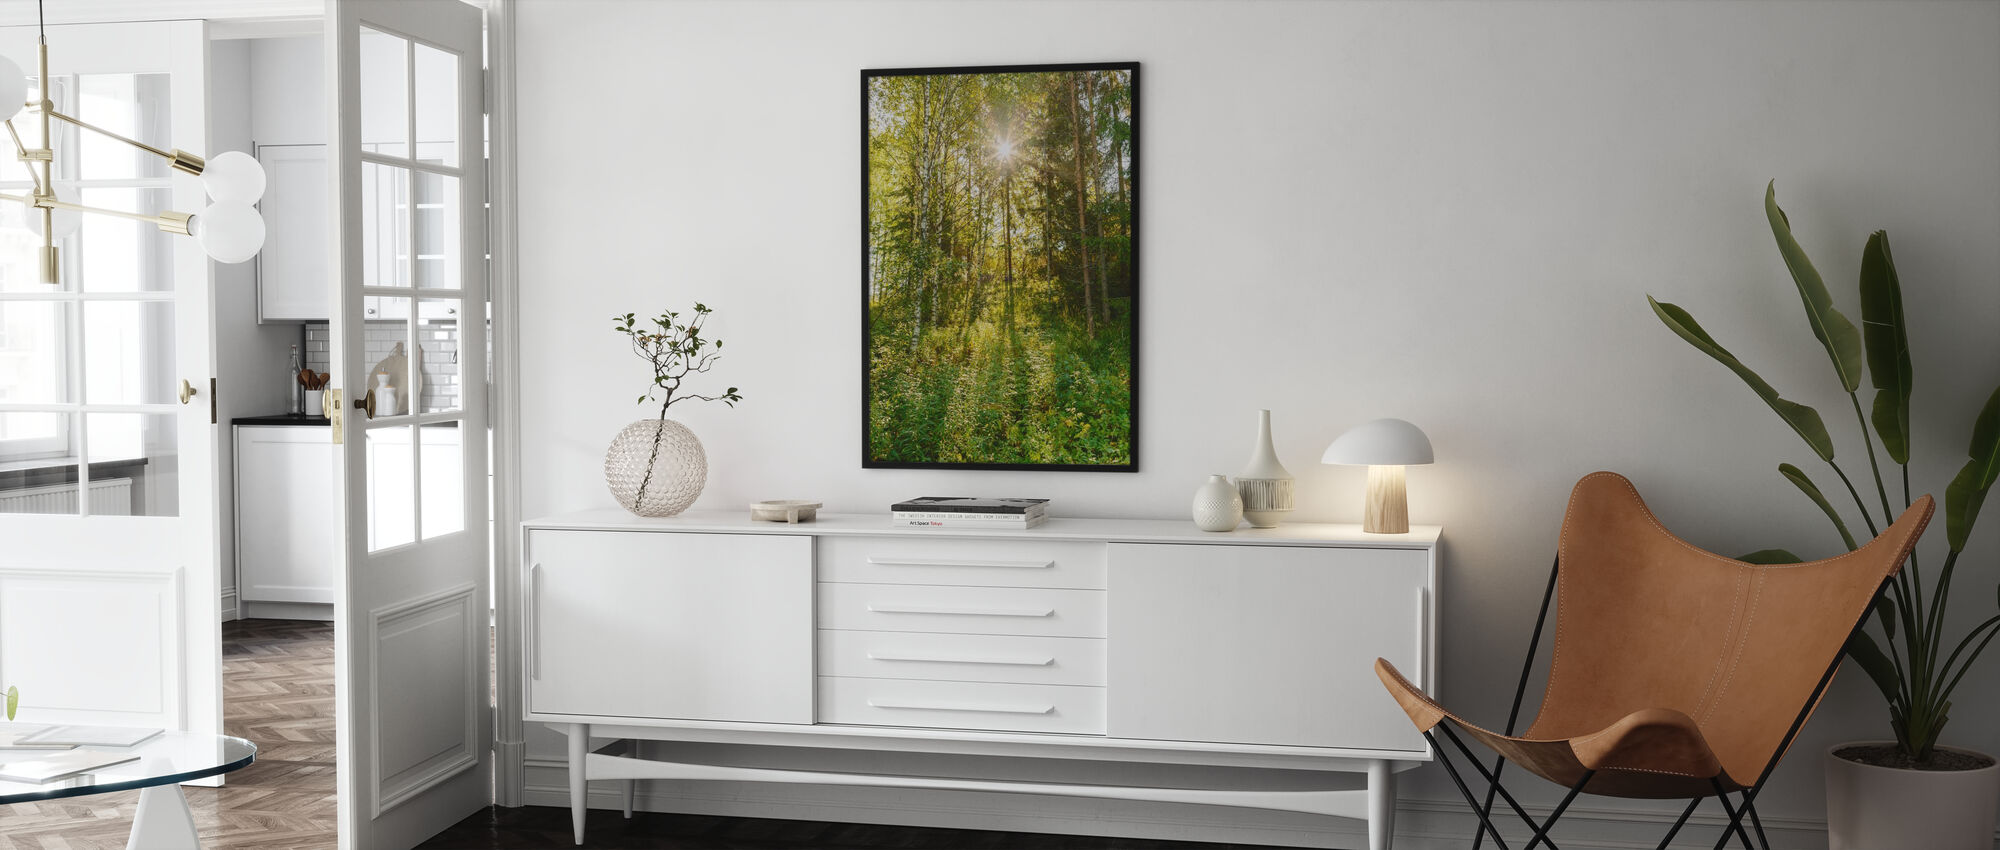 Solbelyste løvtrær, Finland - Plakat - Stue